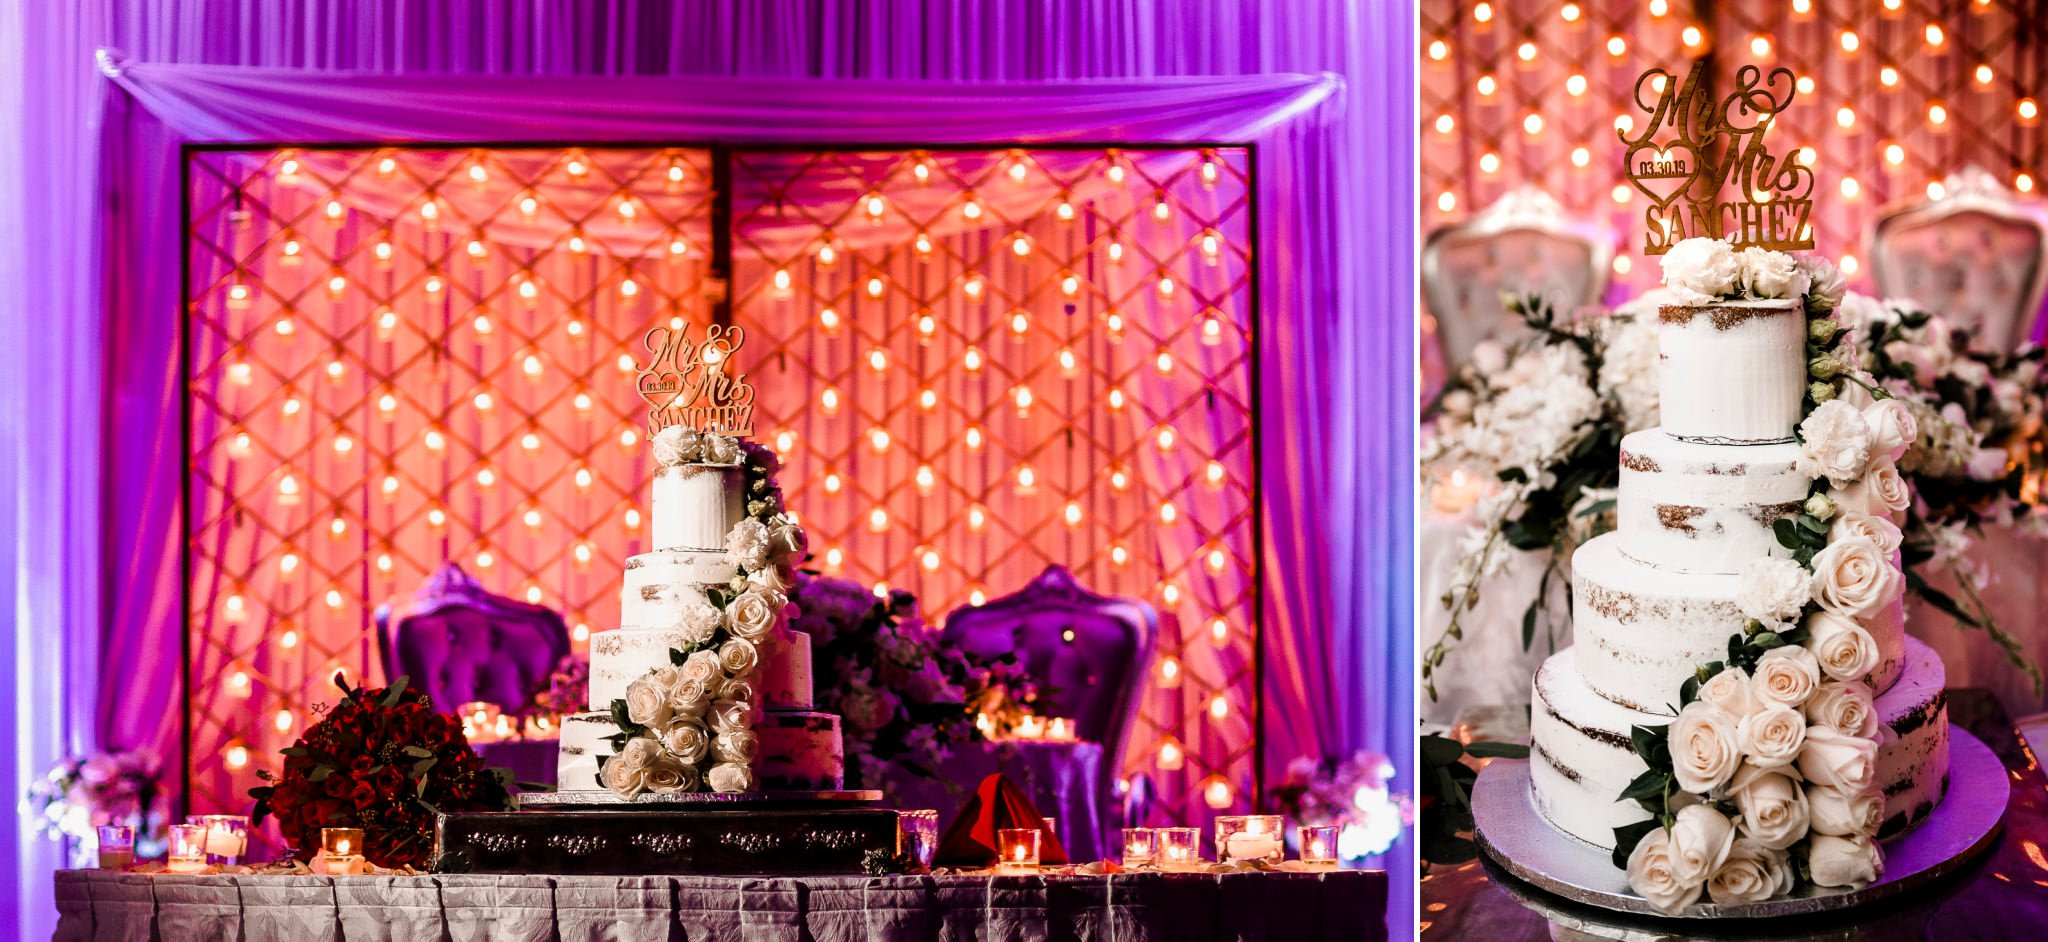 Sanchez-Leonards-Palazzo-New-York-Wedding-Photographer-55.JPG